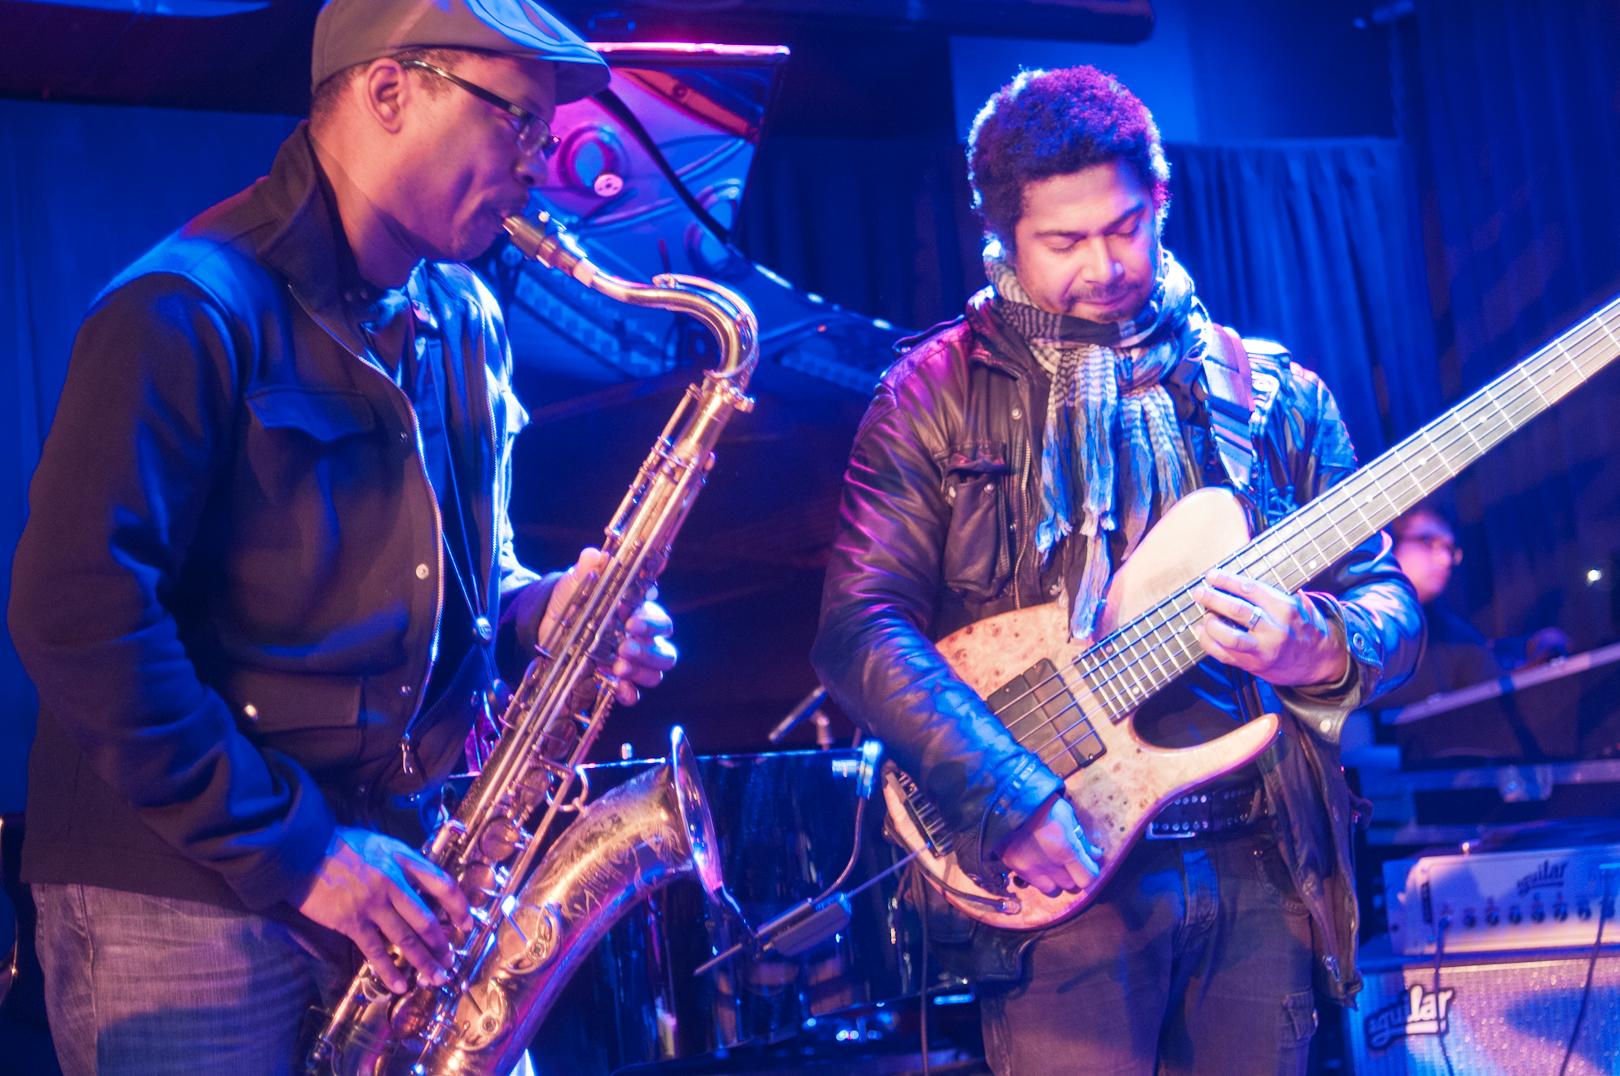 Ravi Coltrane and Matt Garrison at the Winter Jazzfest 2012